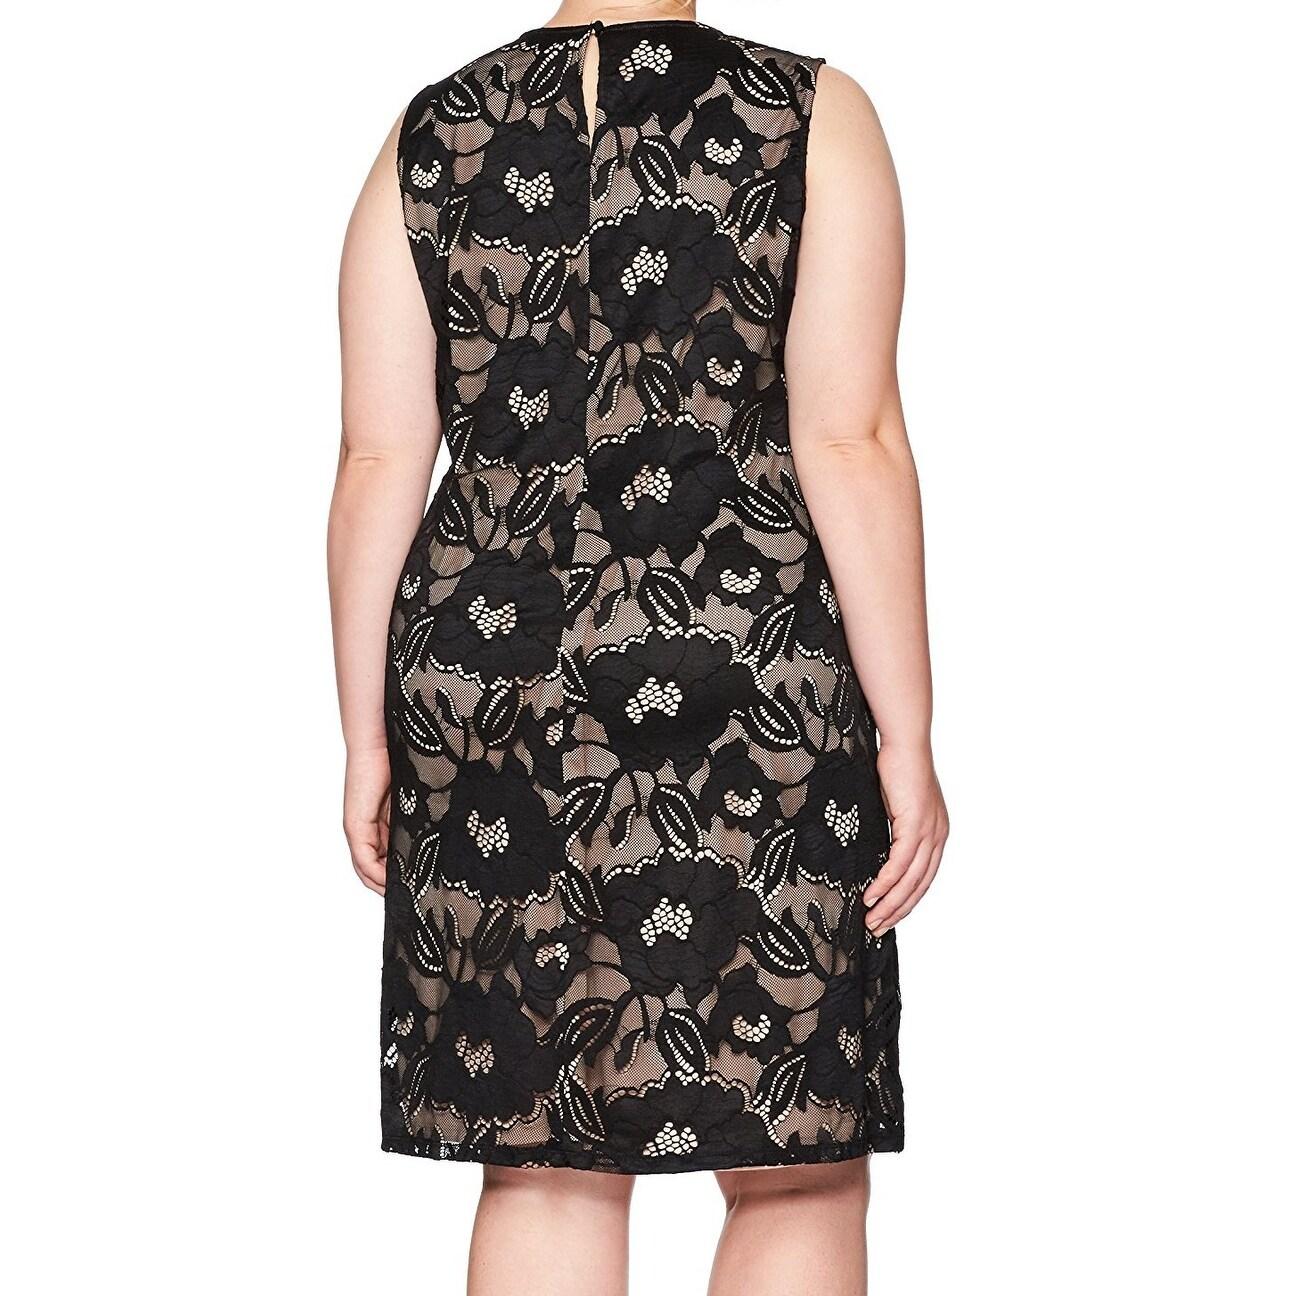 e1a1283cca18b Shop Nine West Black Nude Women s Size 14W Plus Lace Sheath Dress ...